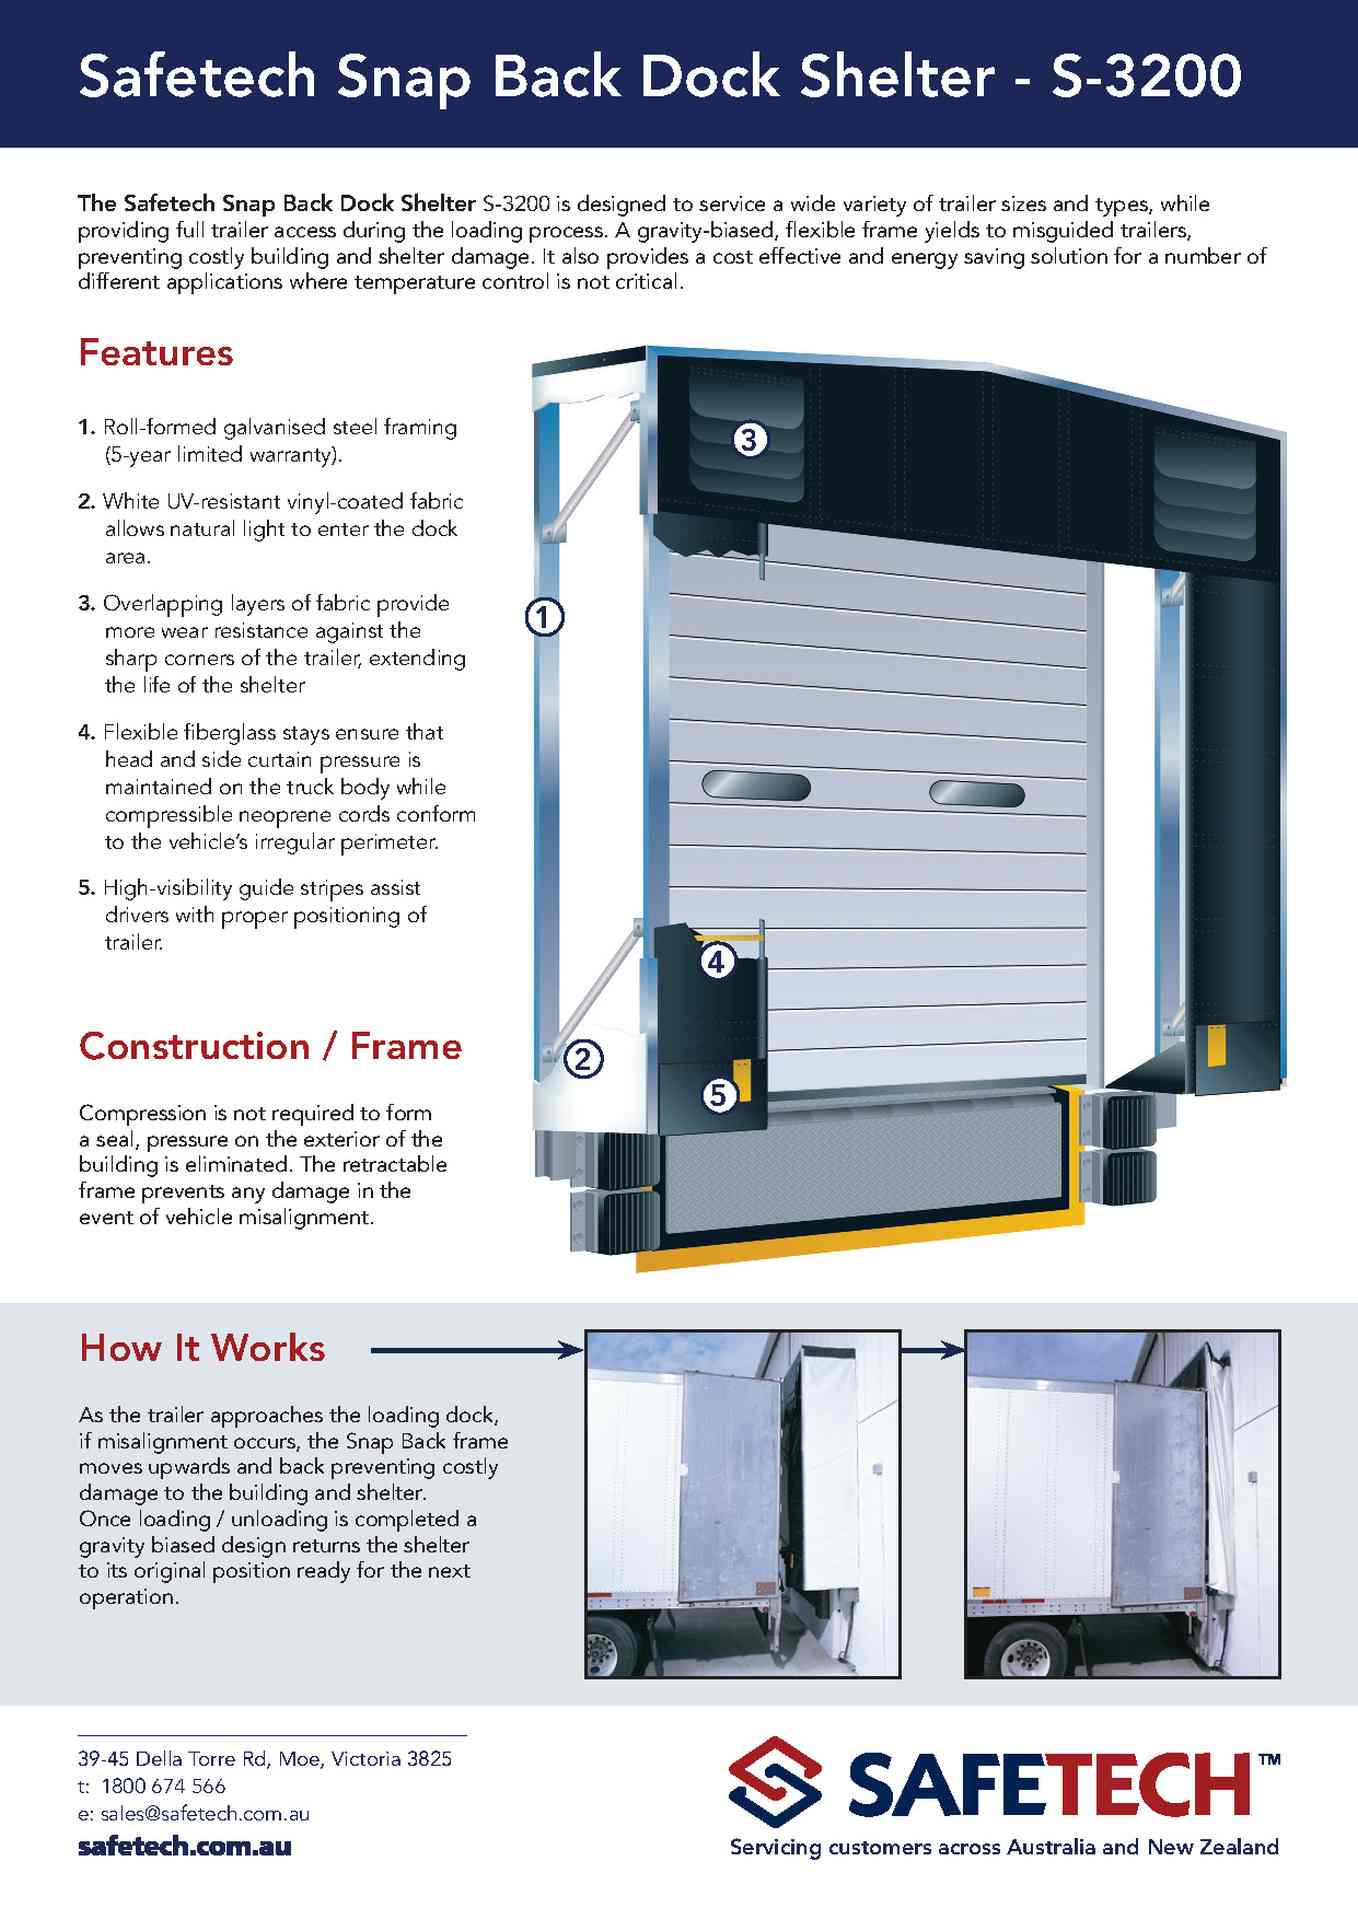 Safetech-SnapBackDockShelter-S3200-A4_V1